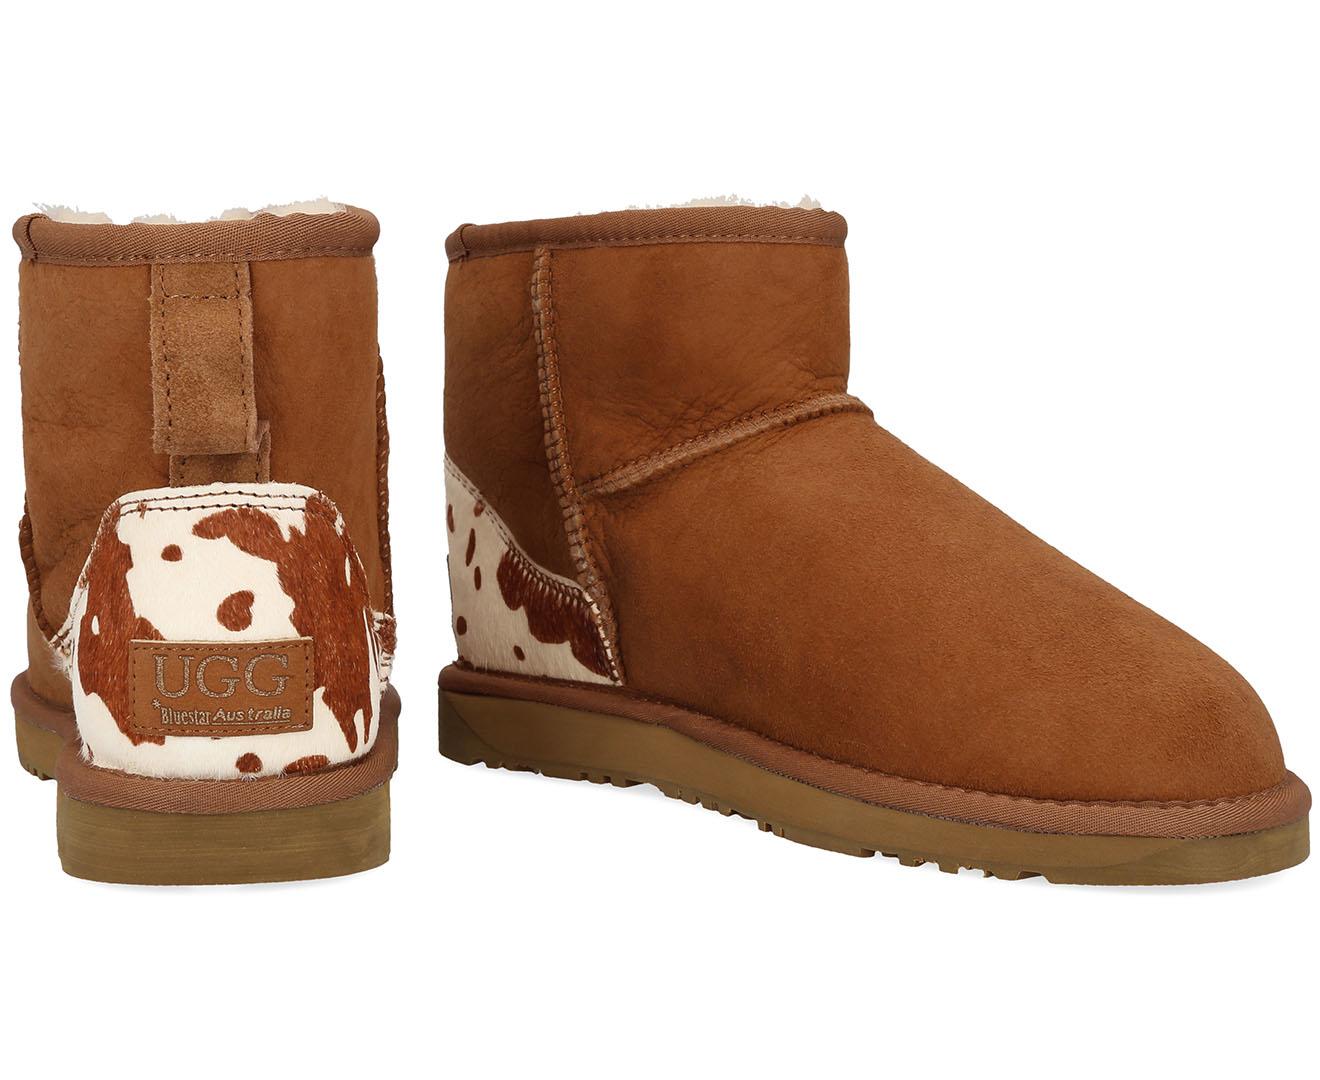 f828f90b37c Details about Bluestar Women's Premium Australian Sheepskin Ugg Boot -  Chestnut Cow